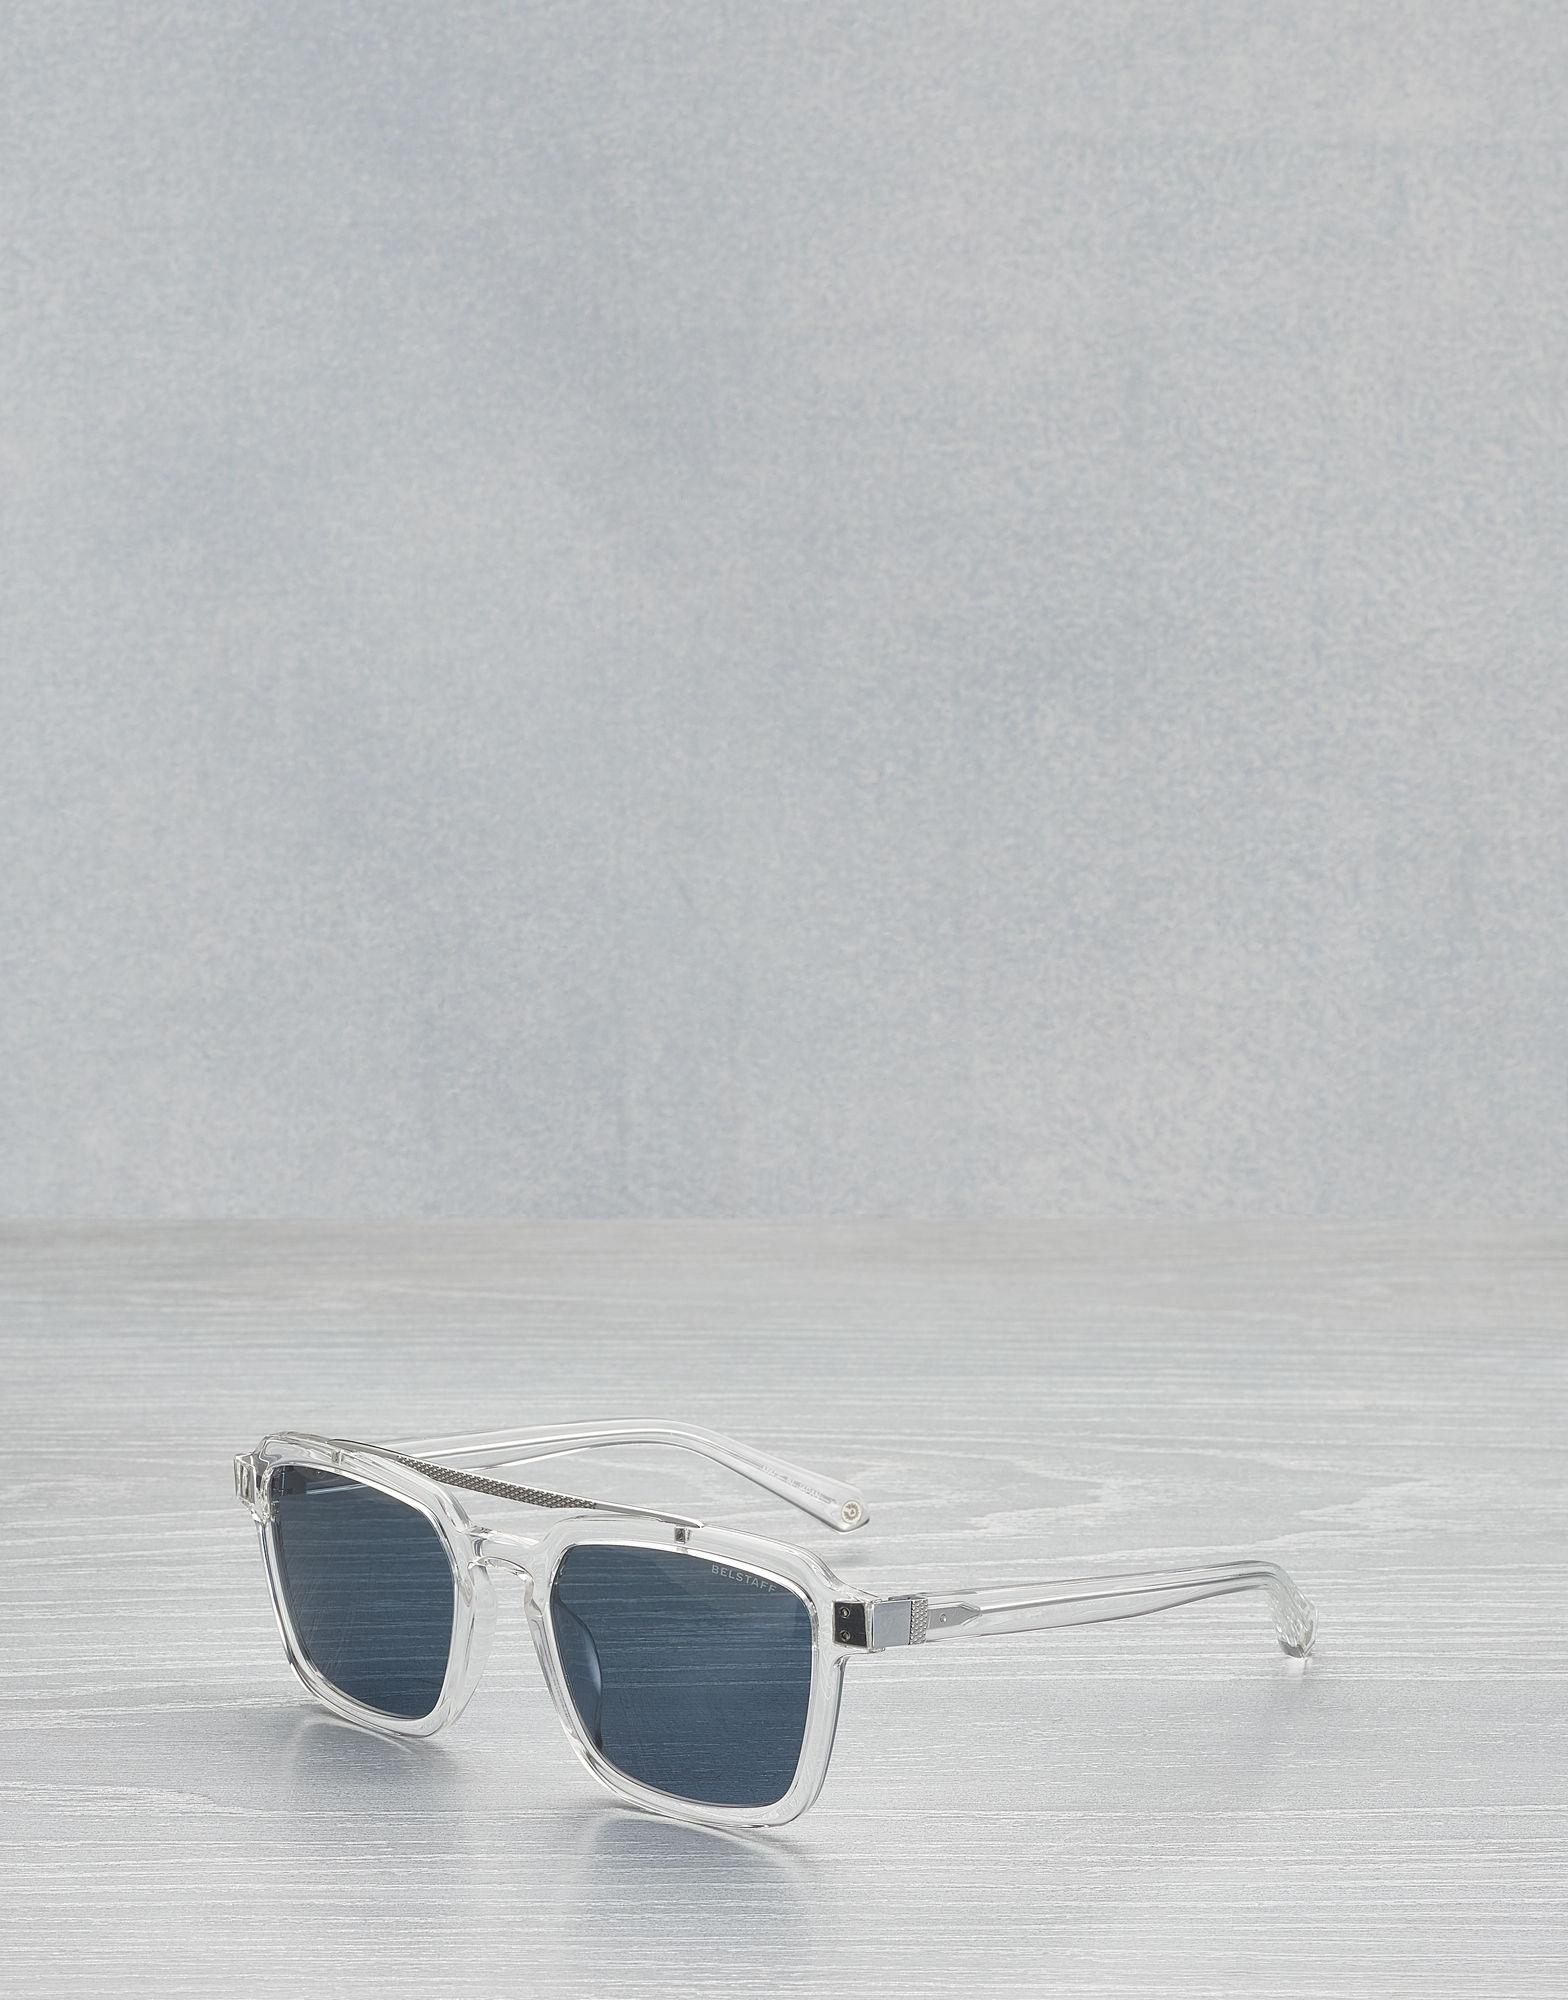 5fb8baa66bcc Belstaff Cassel 18 Sunglasses for Men - Lyst